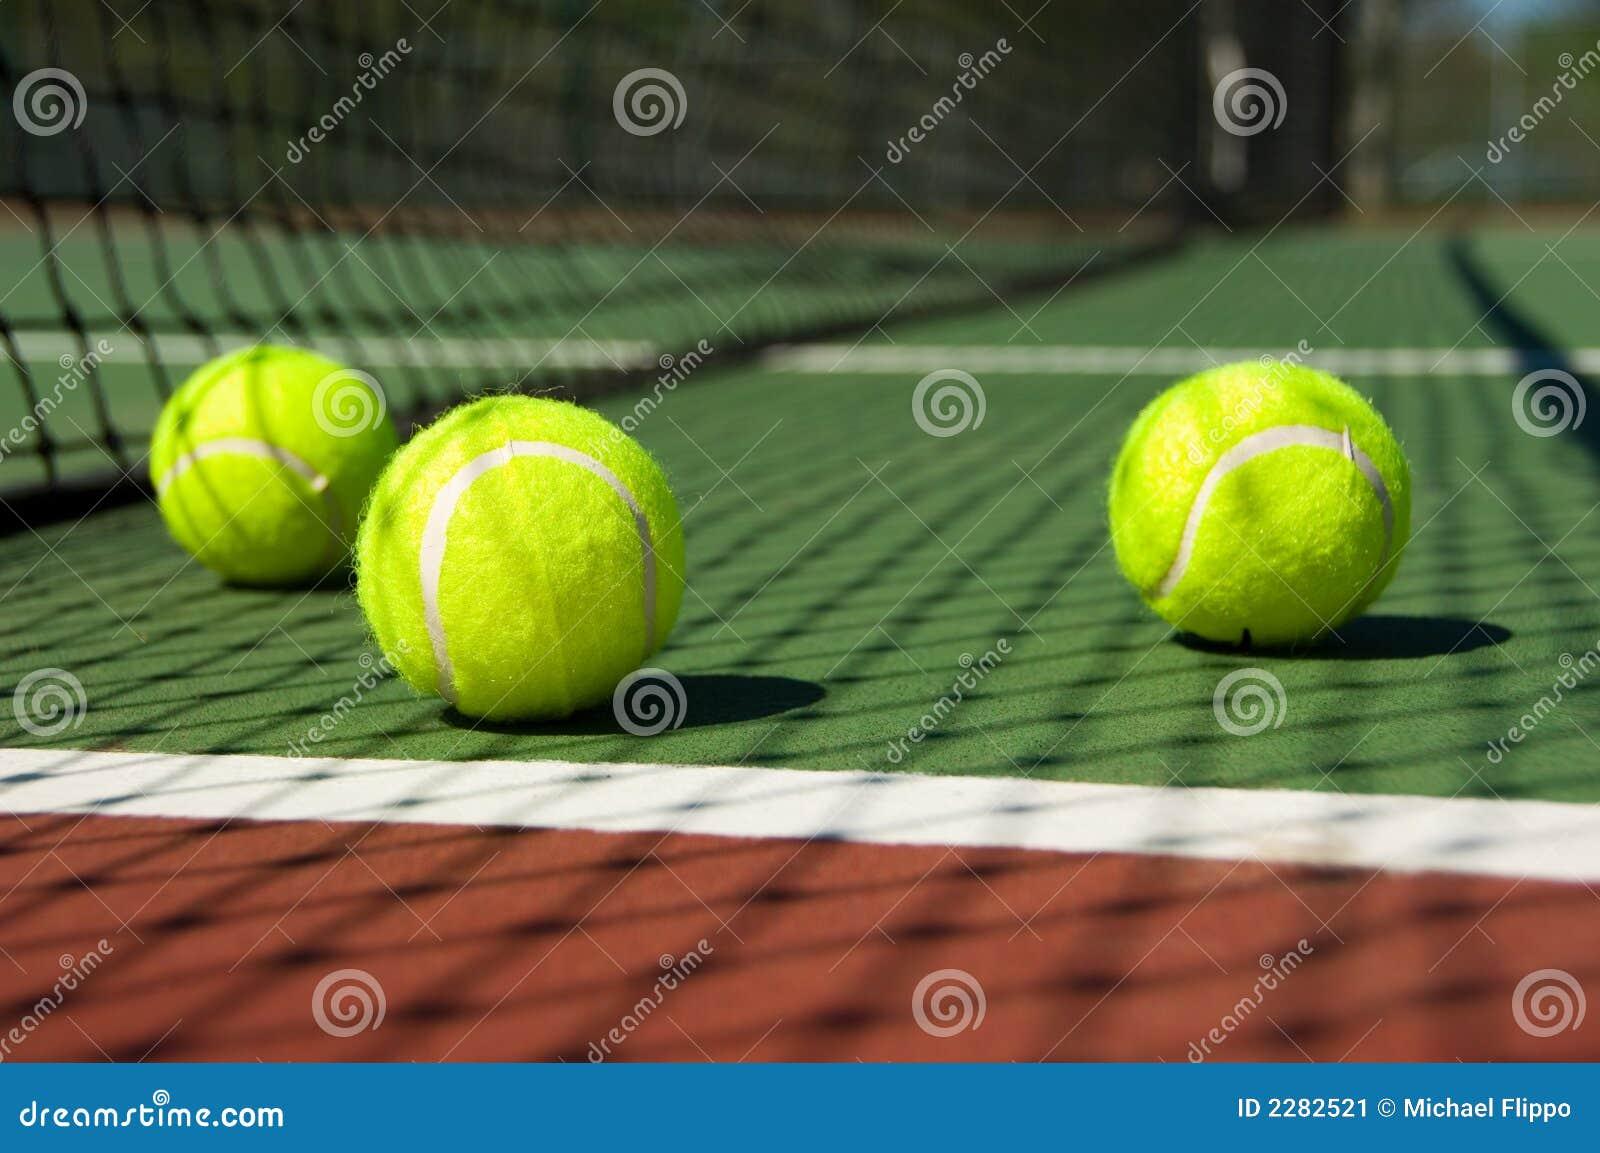 Esferas de tênis na corte